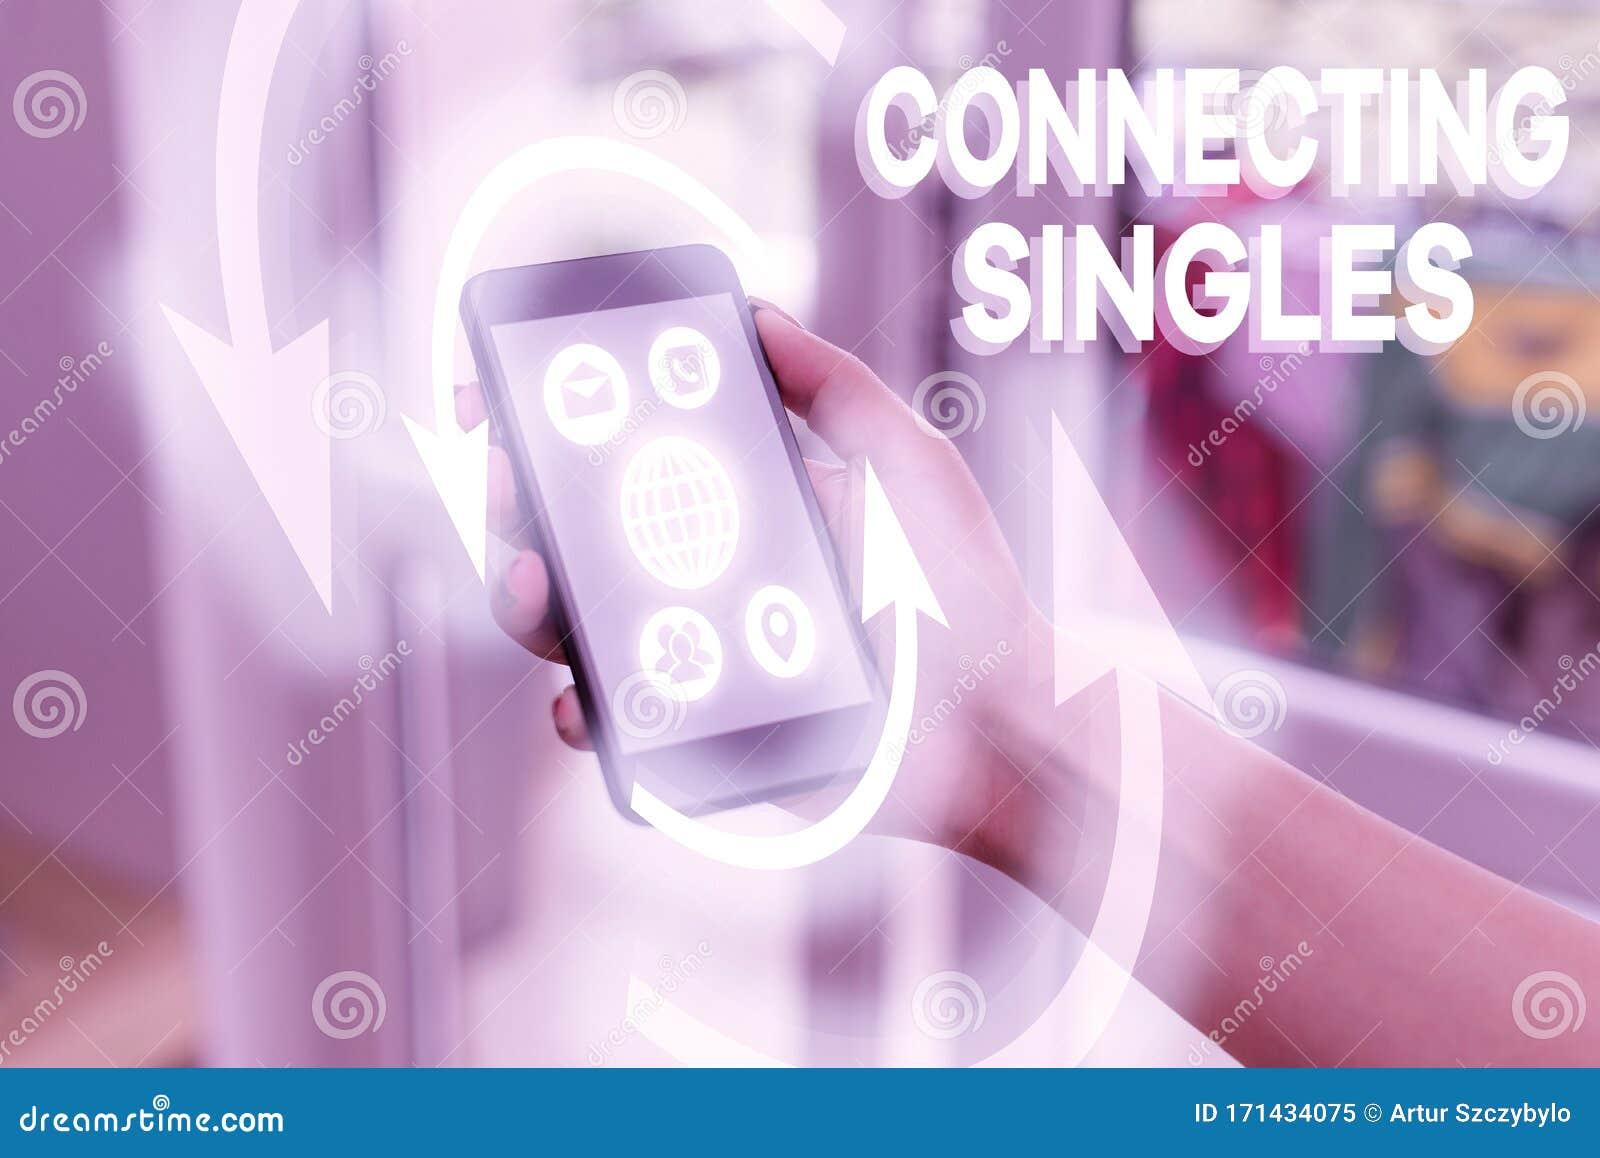 Login www connectingsingles com Australia Dating